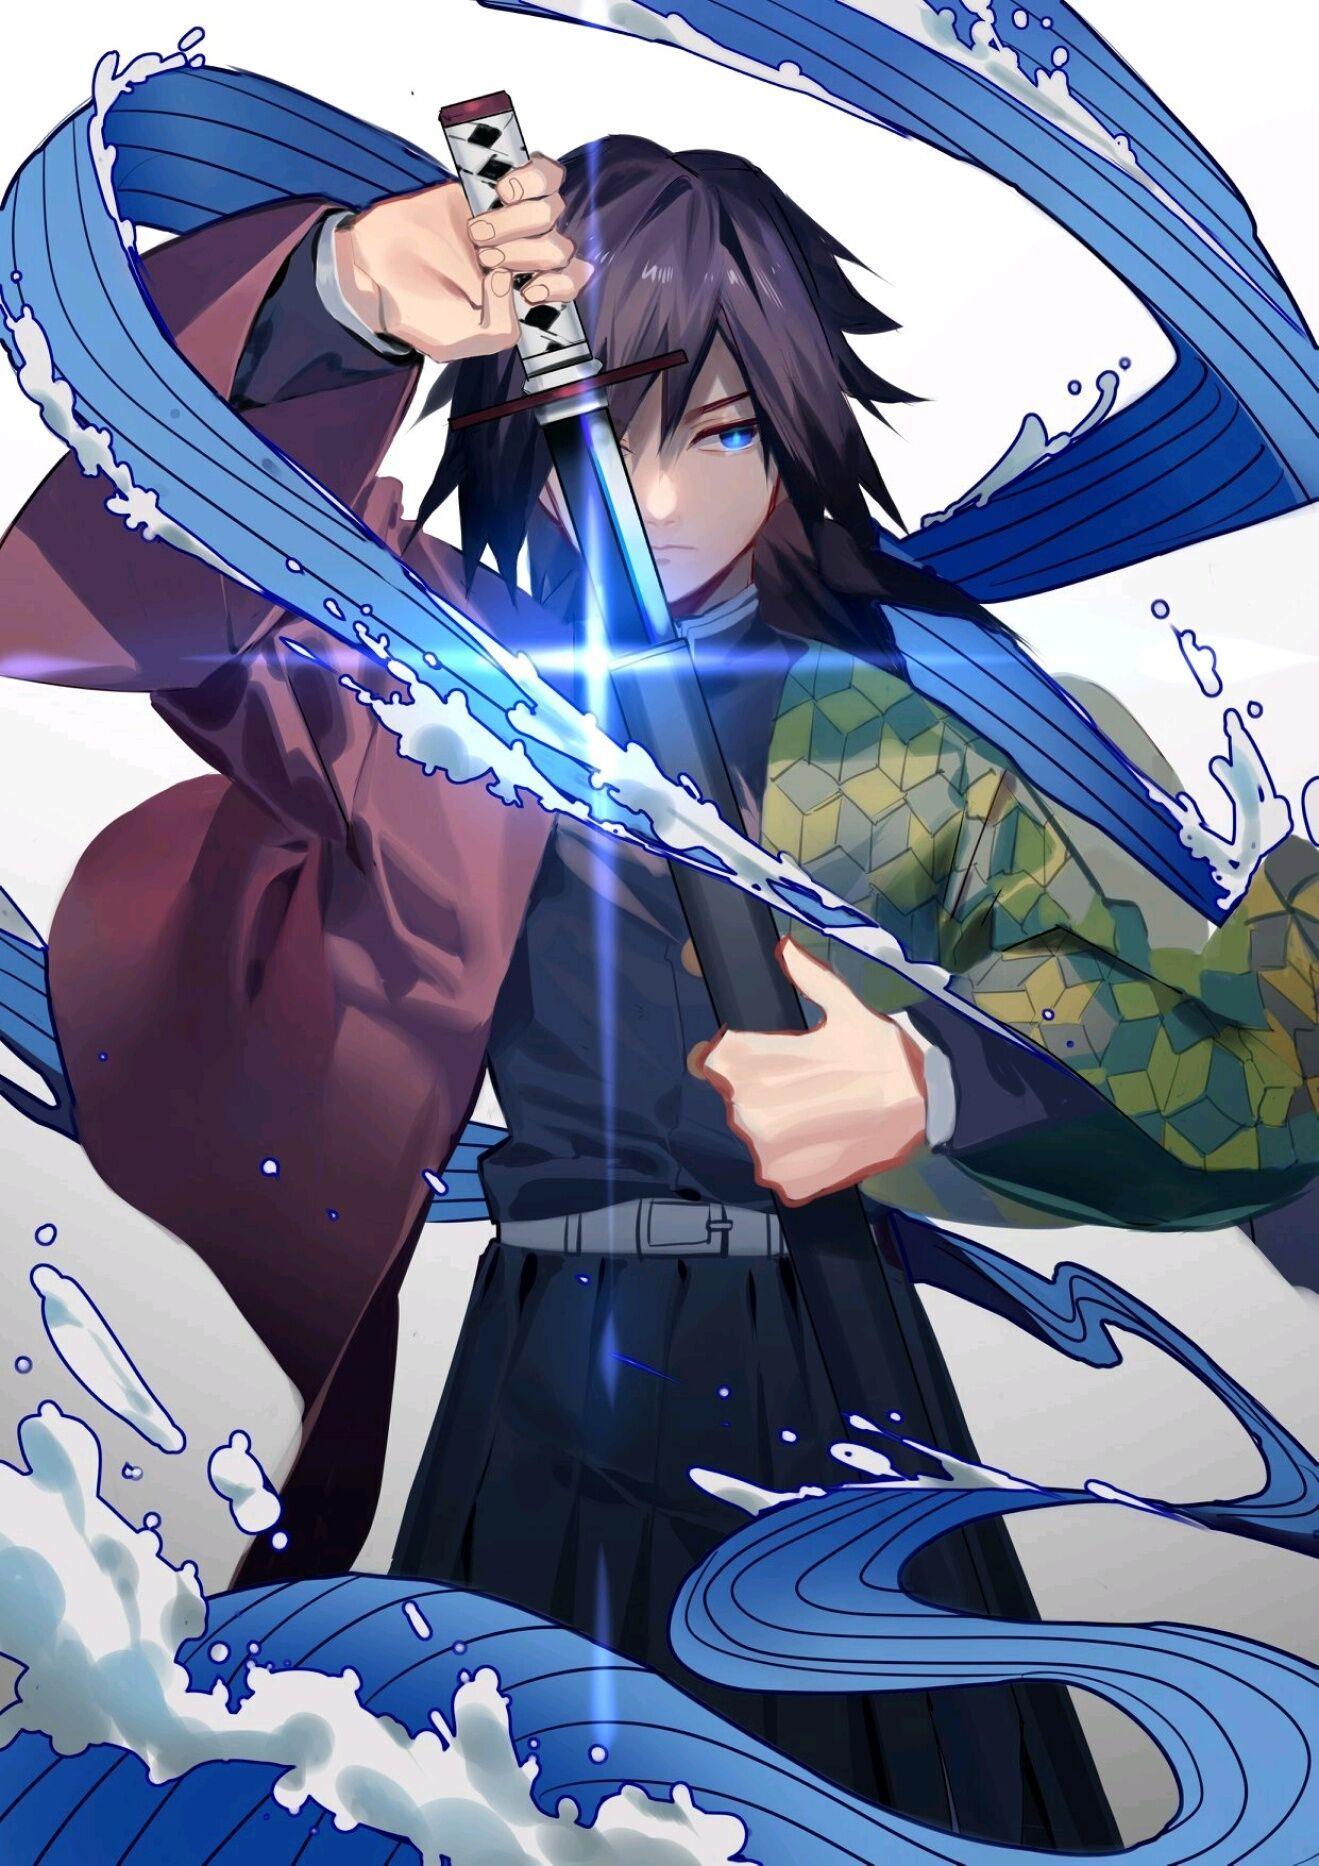 Demon slayer image by ღ kaity kaiser ღ anime demon